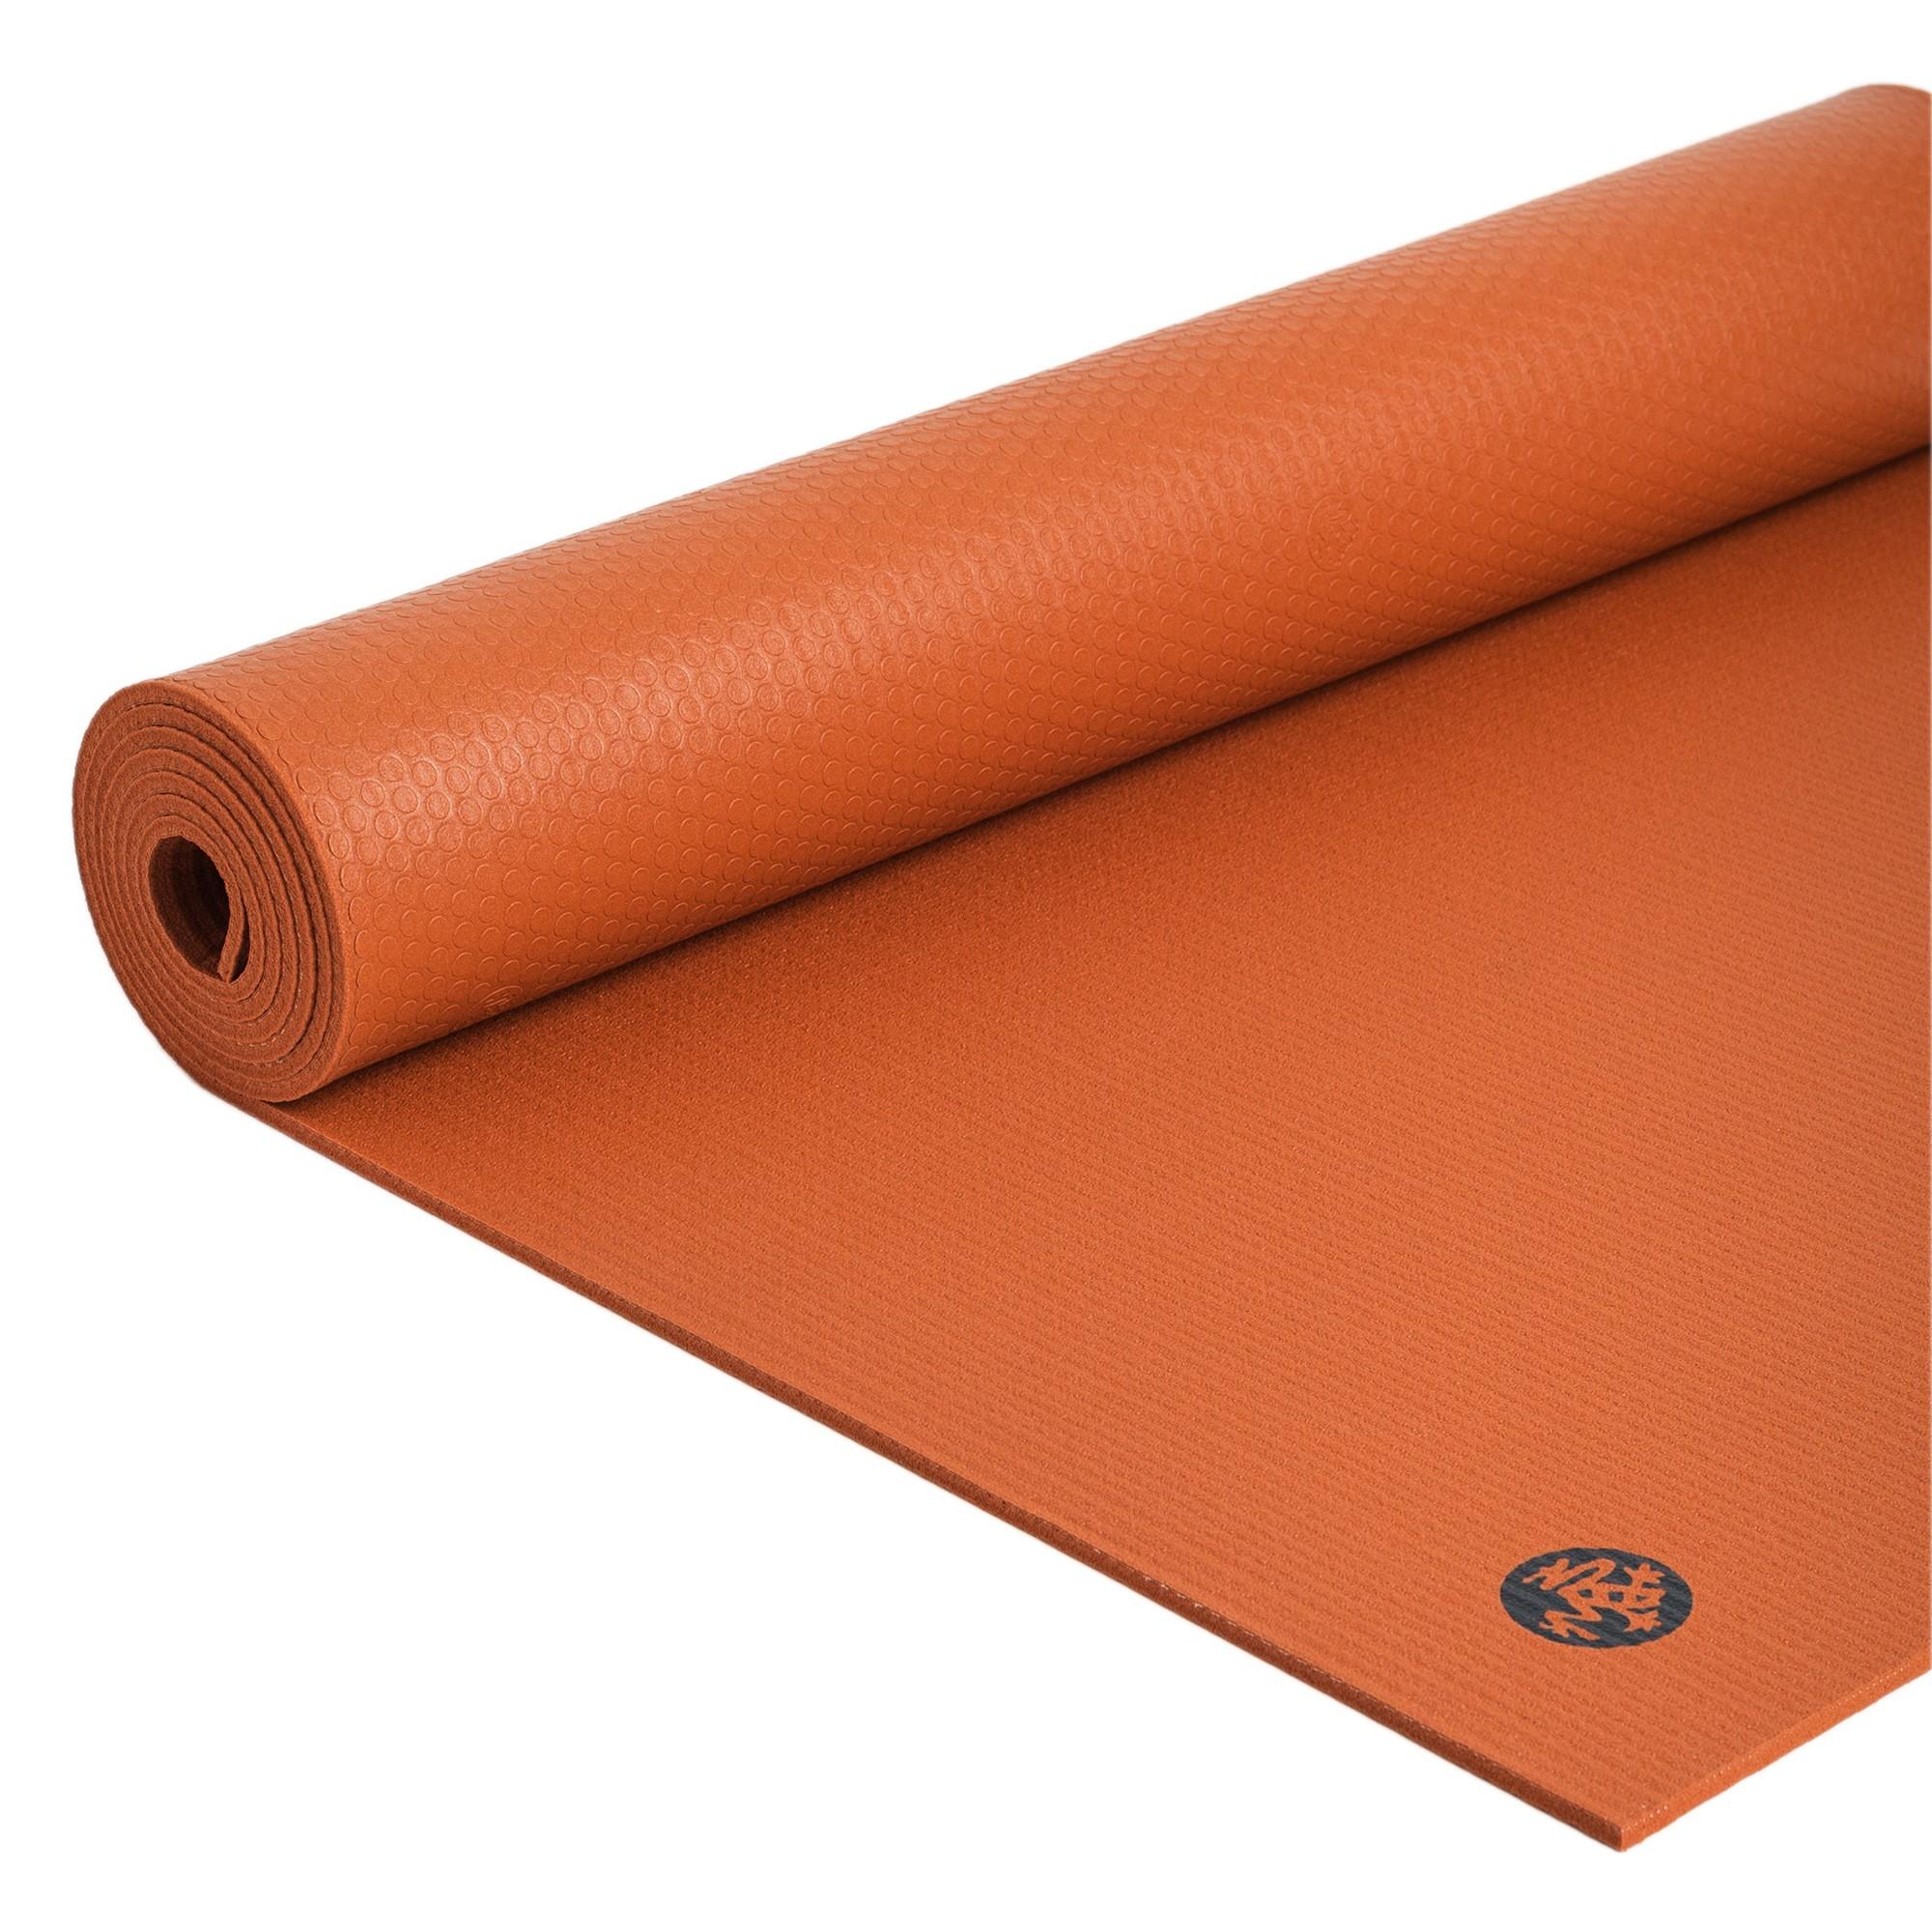 shop towels non bag carry and leggings mat lionheart mexico pink slip mats hull copy bright multi yoga hot towel open